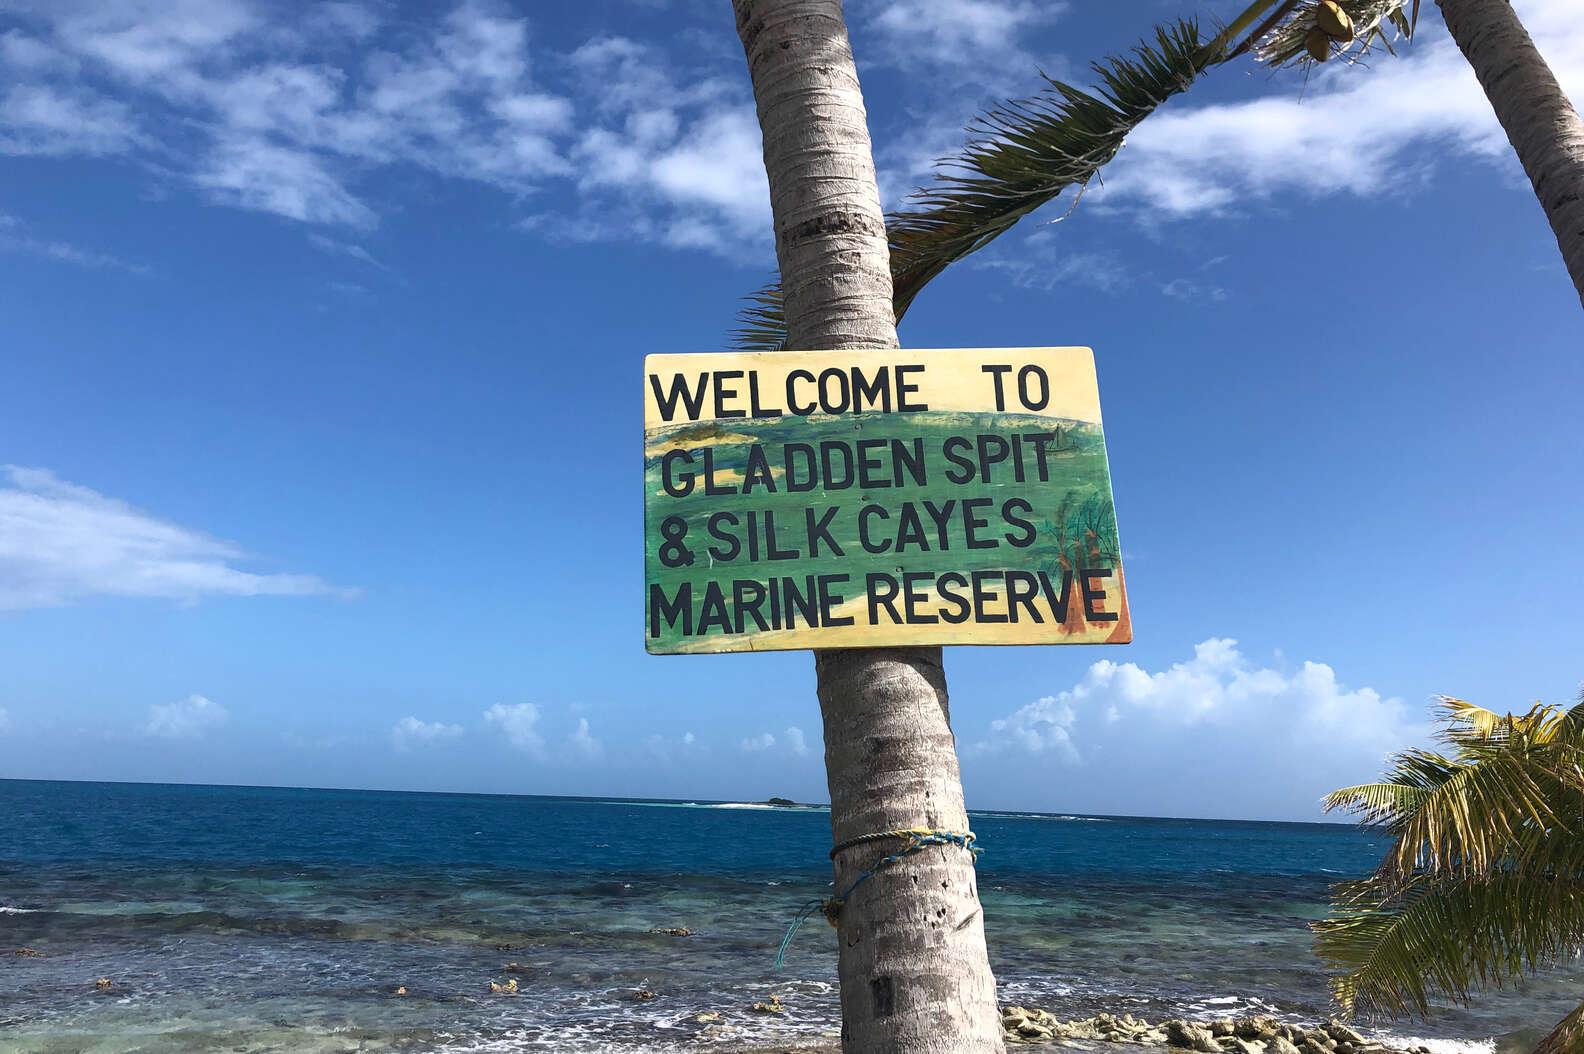 Gladden Spit and Silk Cayes Marine Reserve in Belize | DIANA WILSON:SHUTTERSTOCK